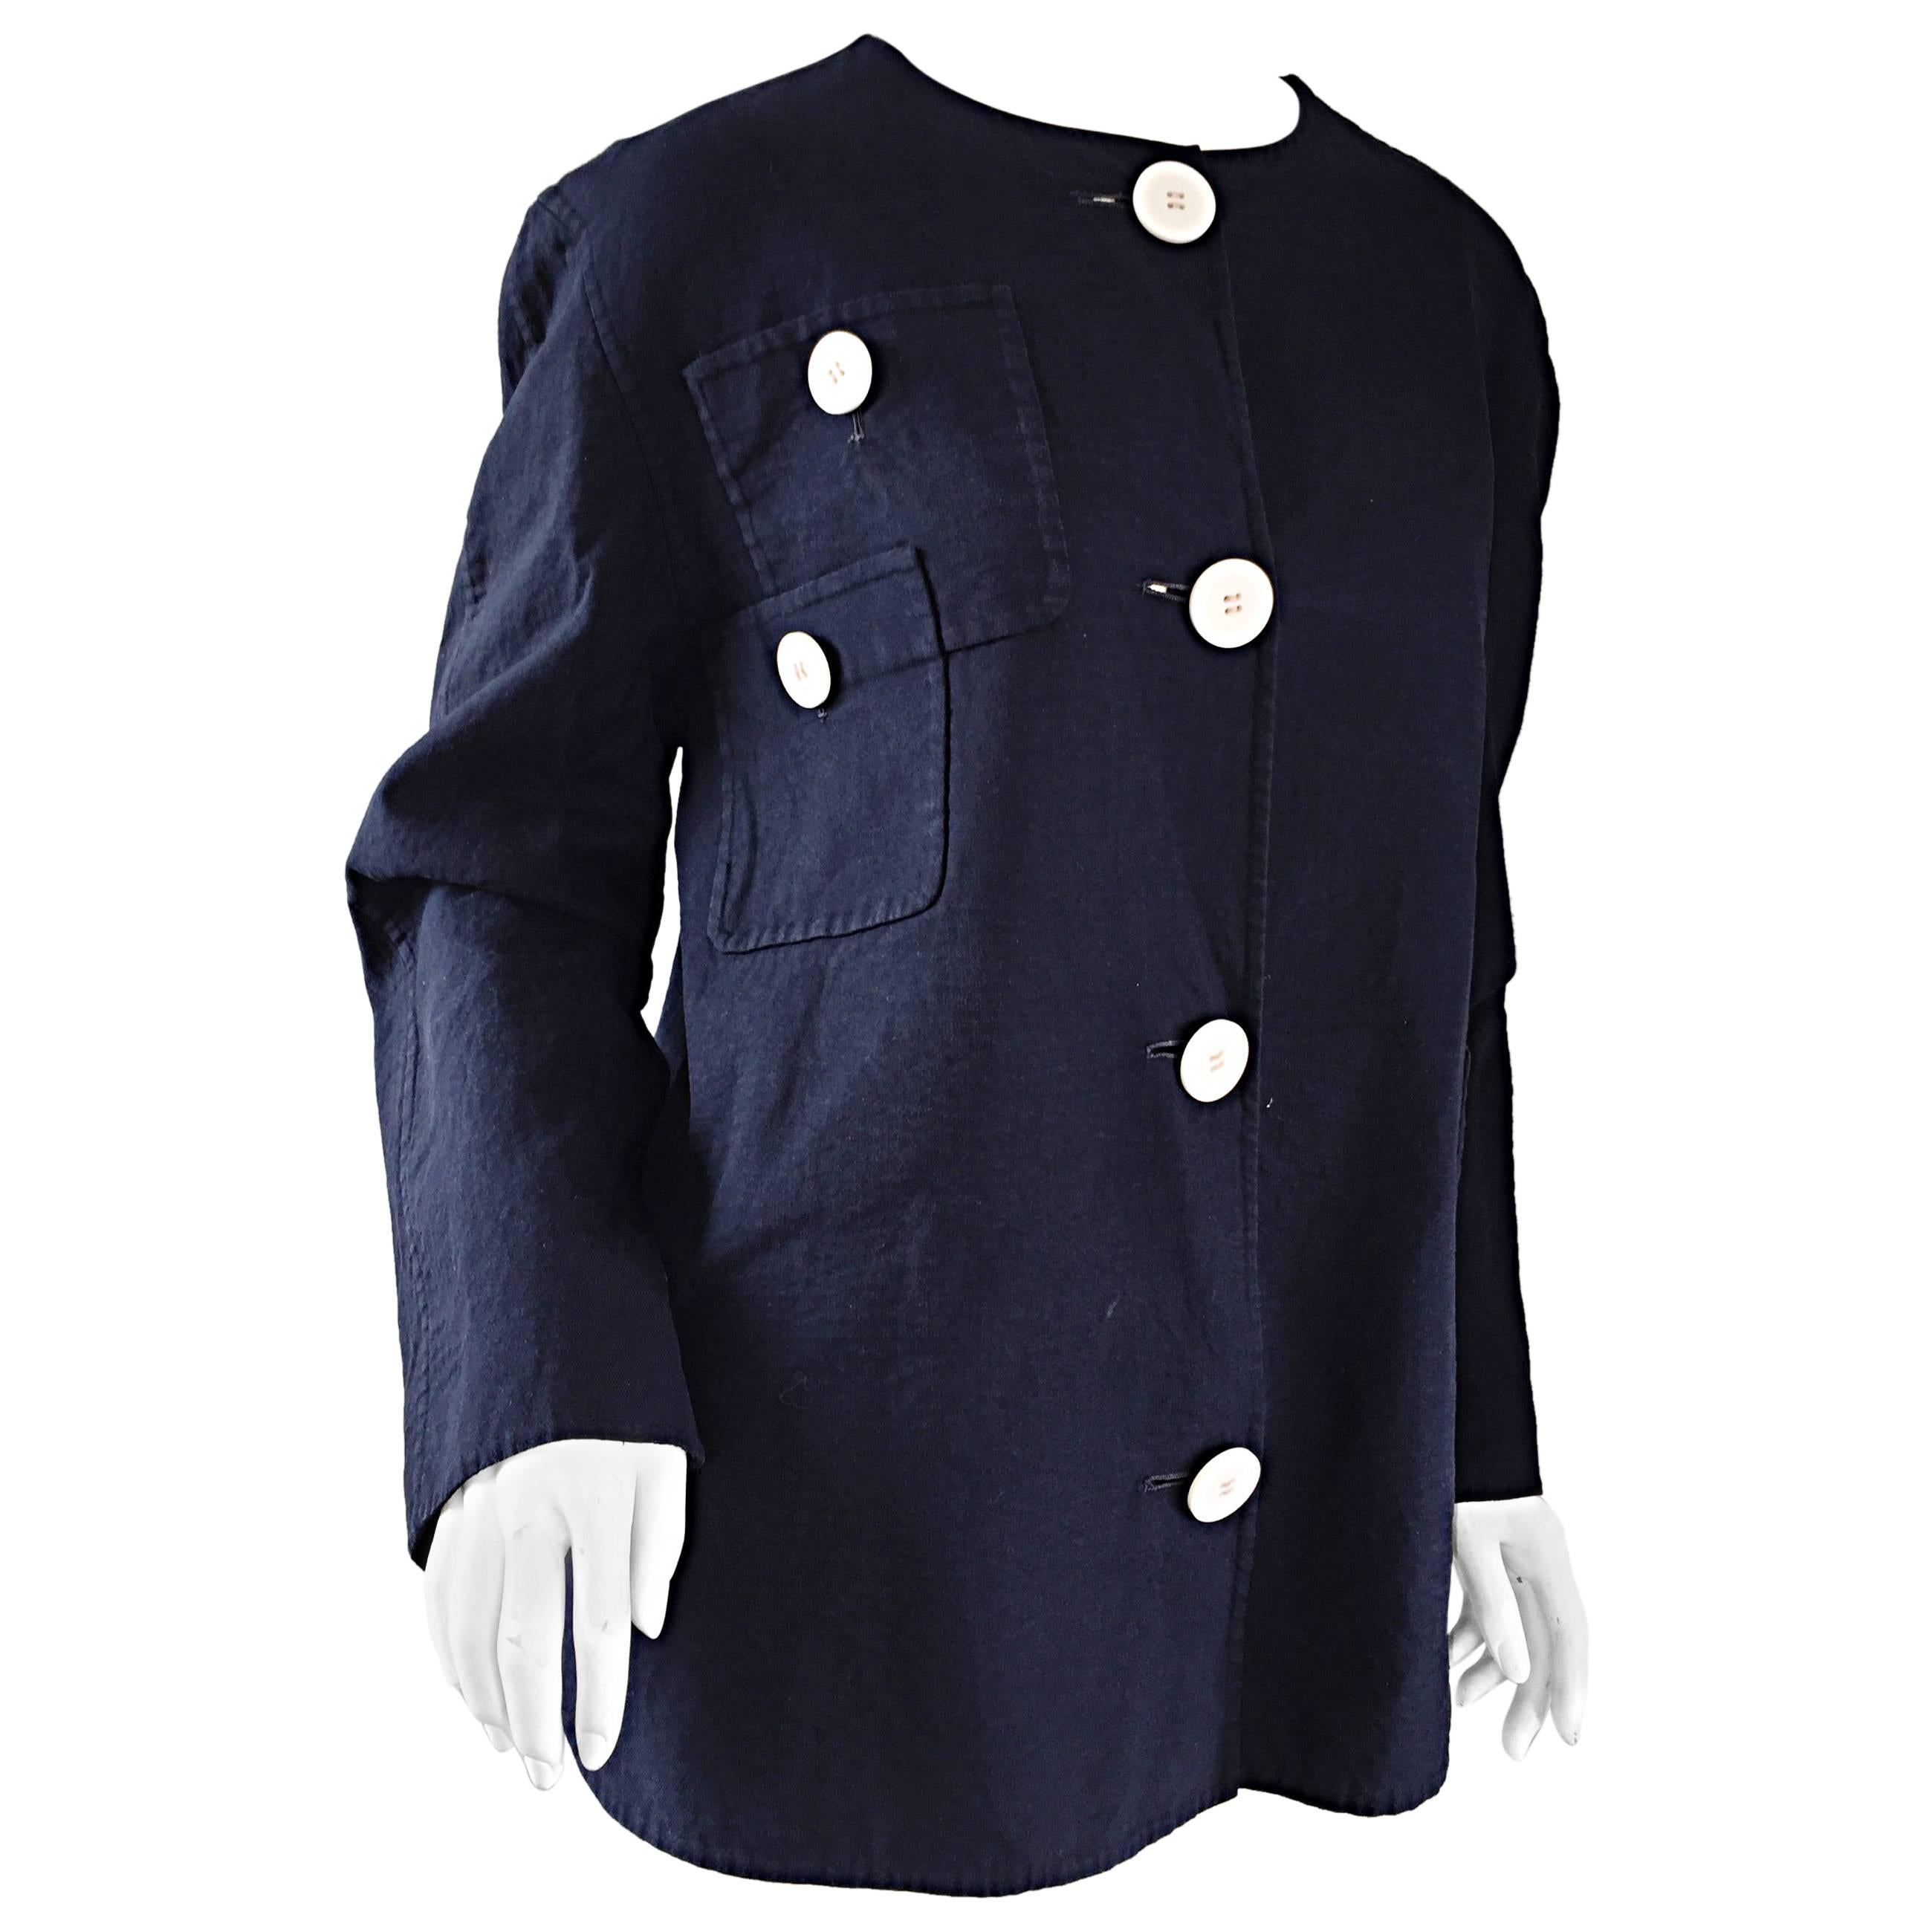 683a49c8da 1960s Bill Blass for Bergdorf Goodman Navy Blue + White Nautical Swing  Jacket For Sale at 1stdibs